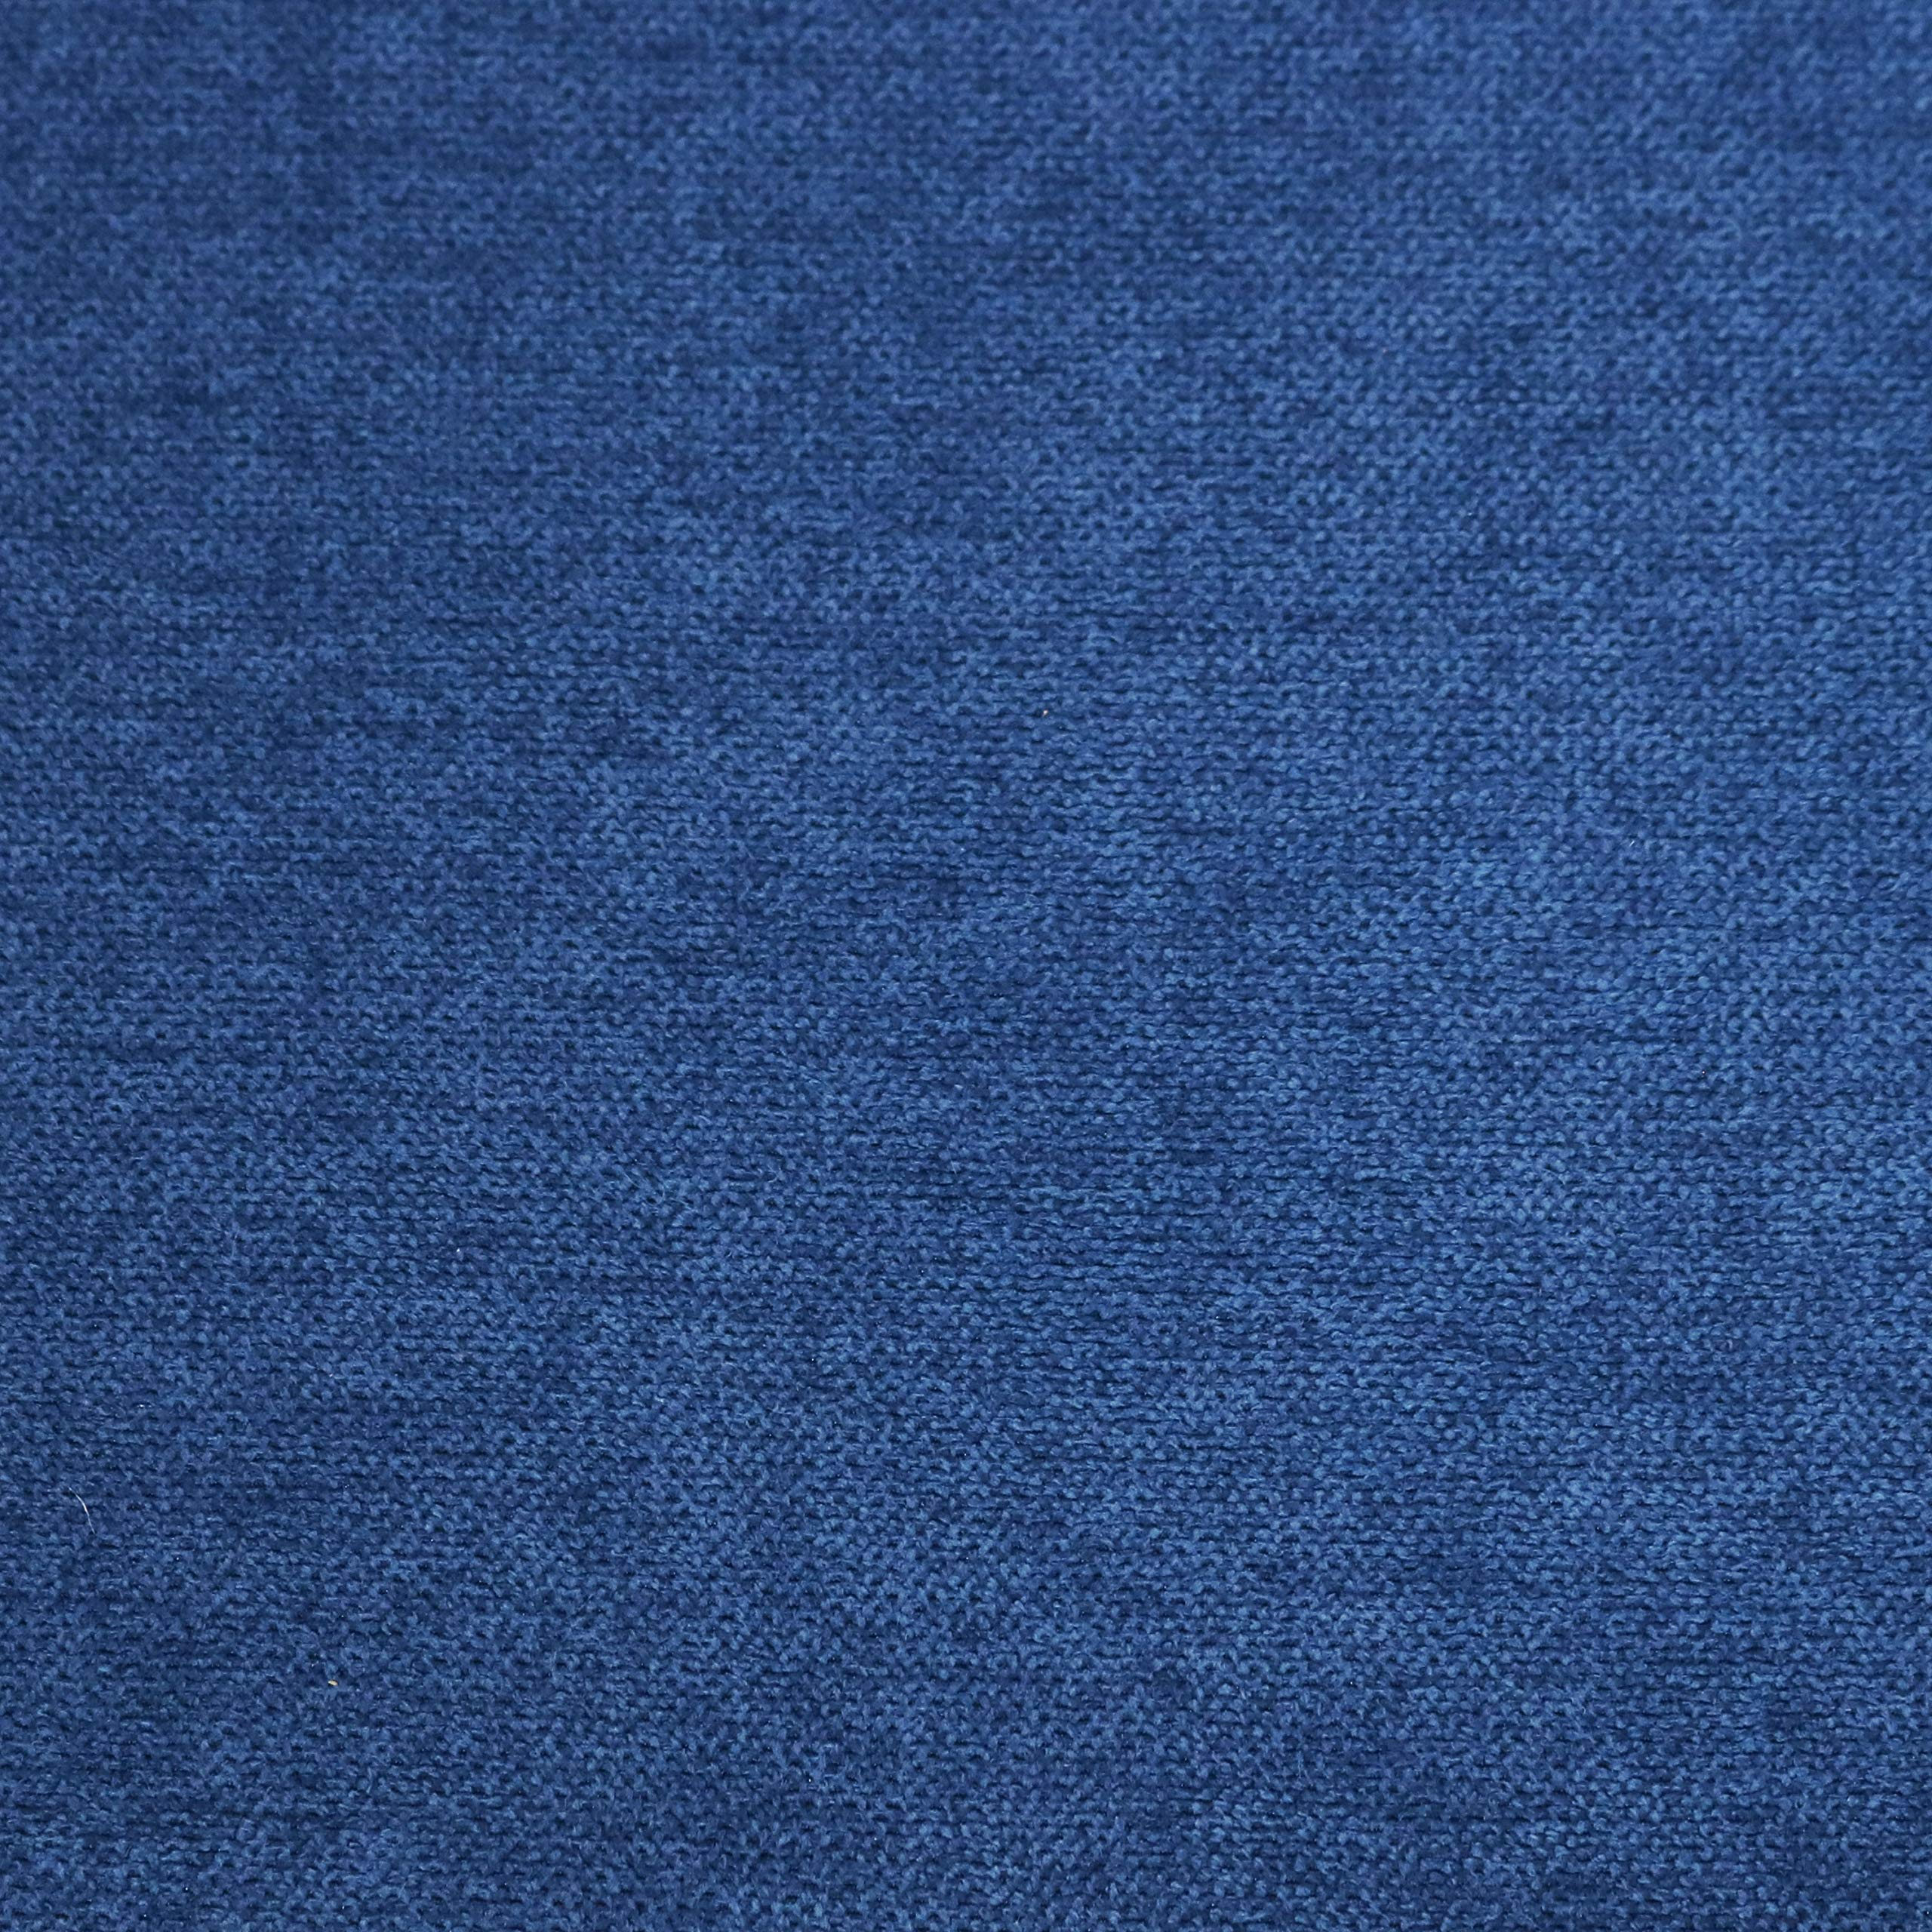 CASL Brands File Cabinet Cushion Seat Top for Mobile Pedestals, Magnetic Back, Blue by CASL Brands (Image #4)